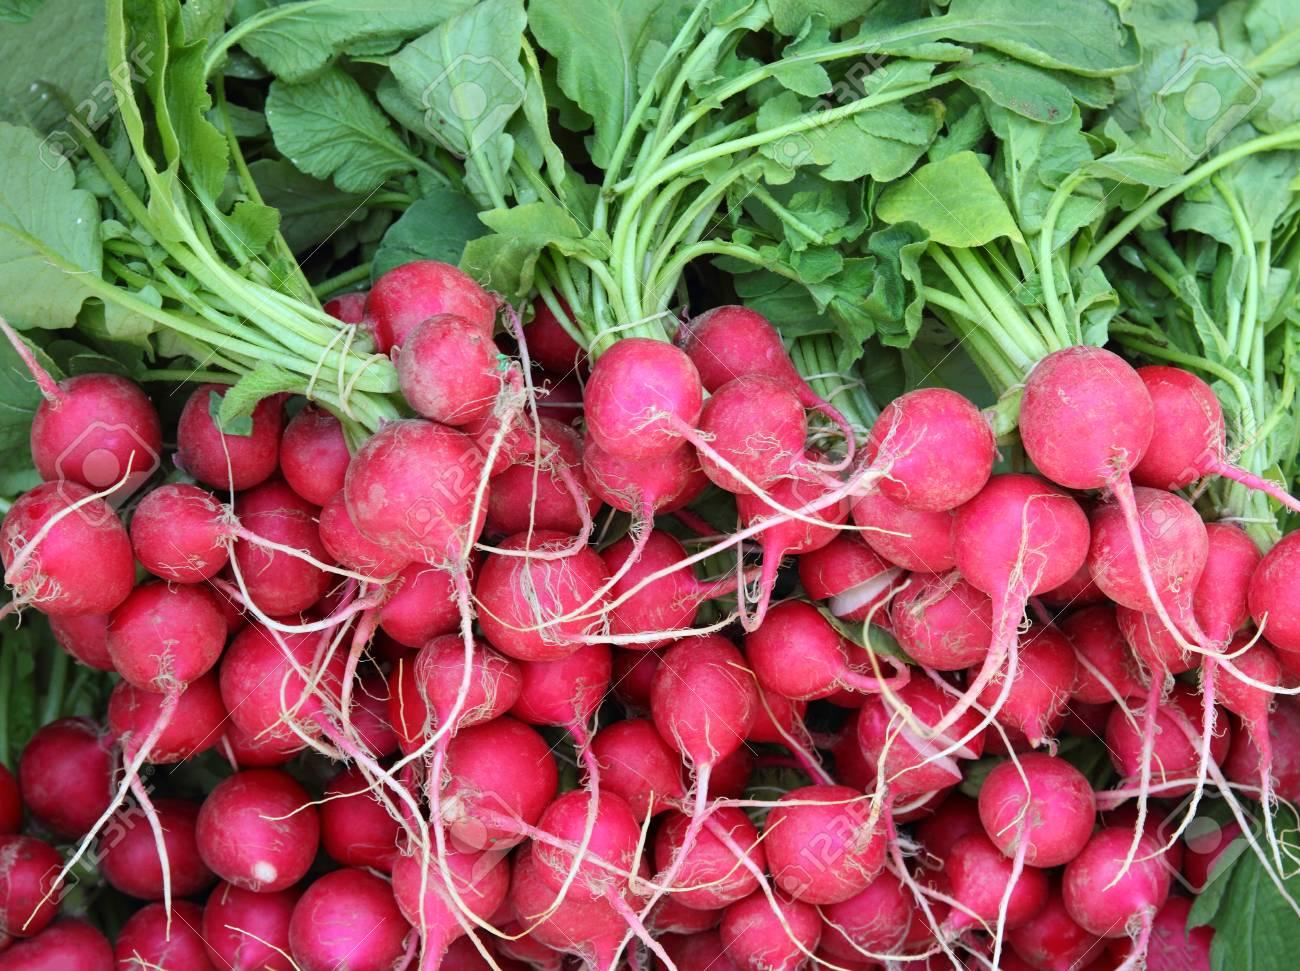 many bunches of radish in market Stock Photo - 23558177